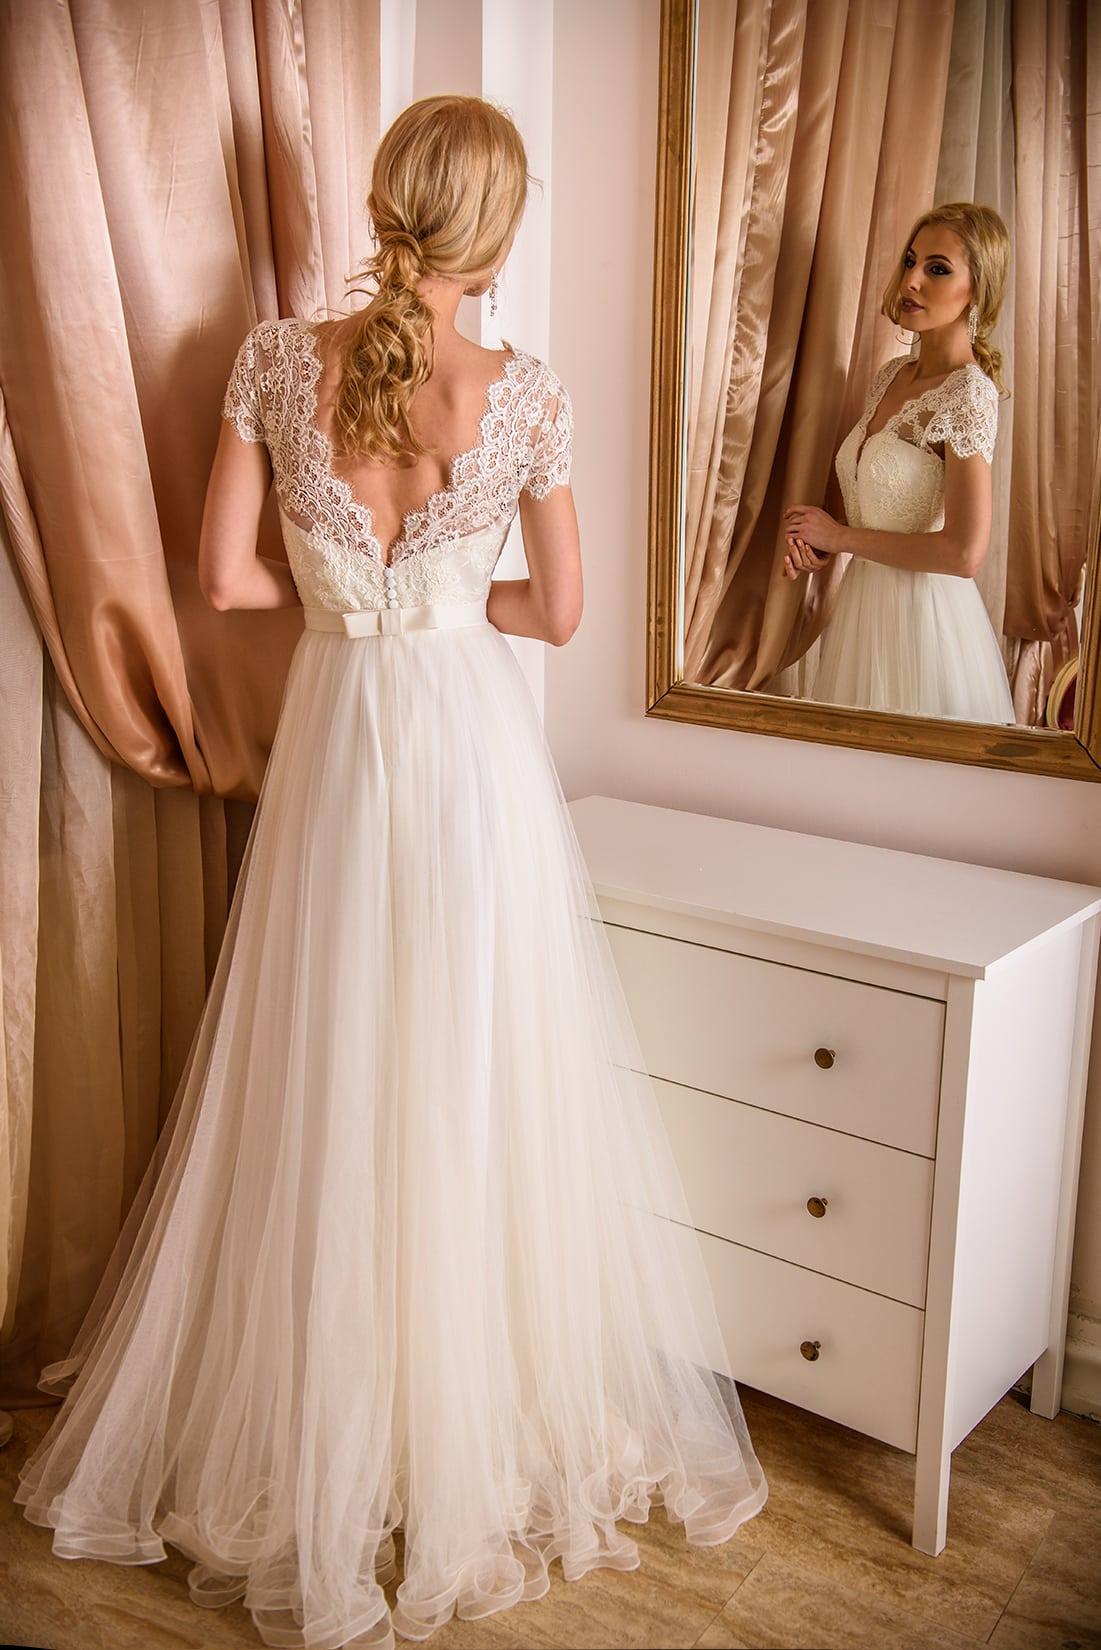 Nika Model - Colectia Baroque - Adora Sposa (3)